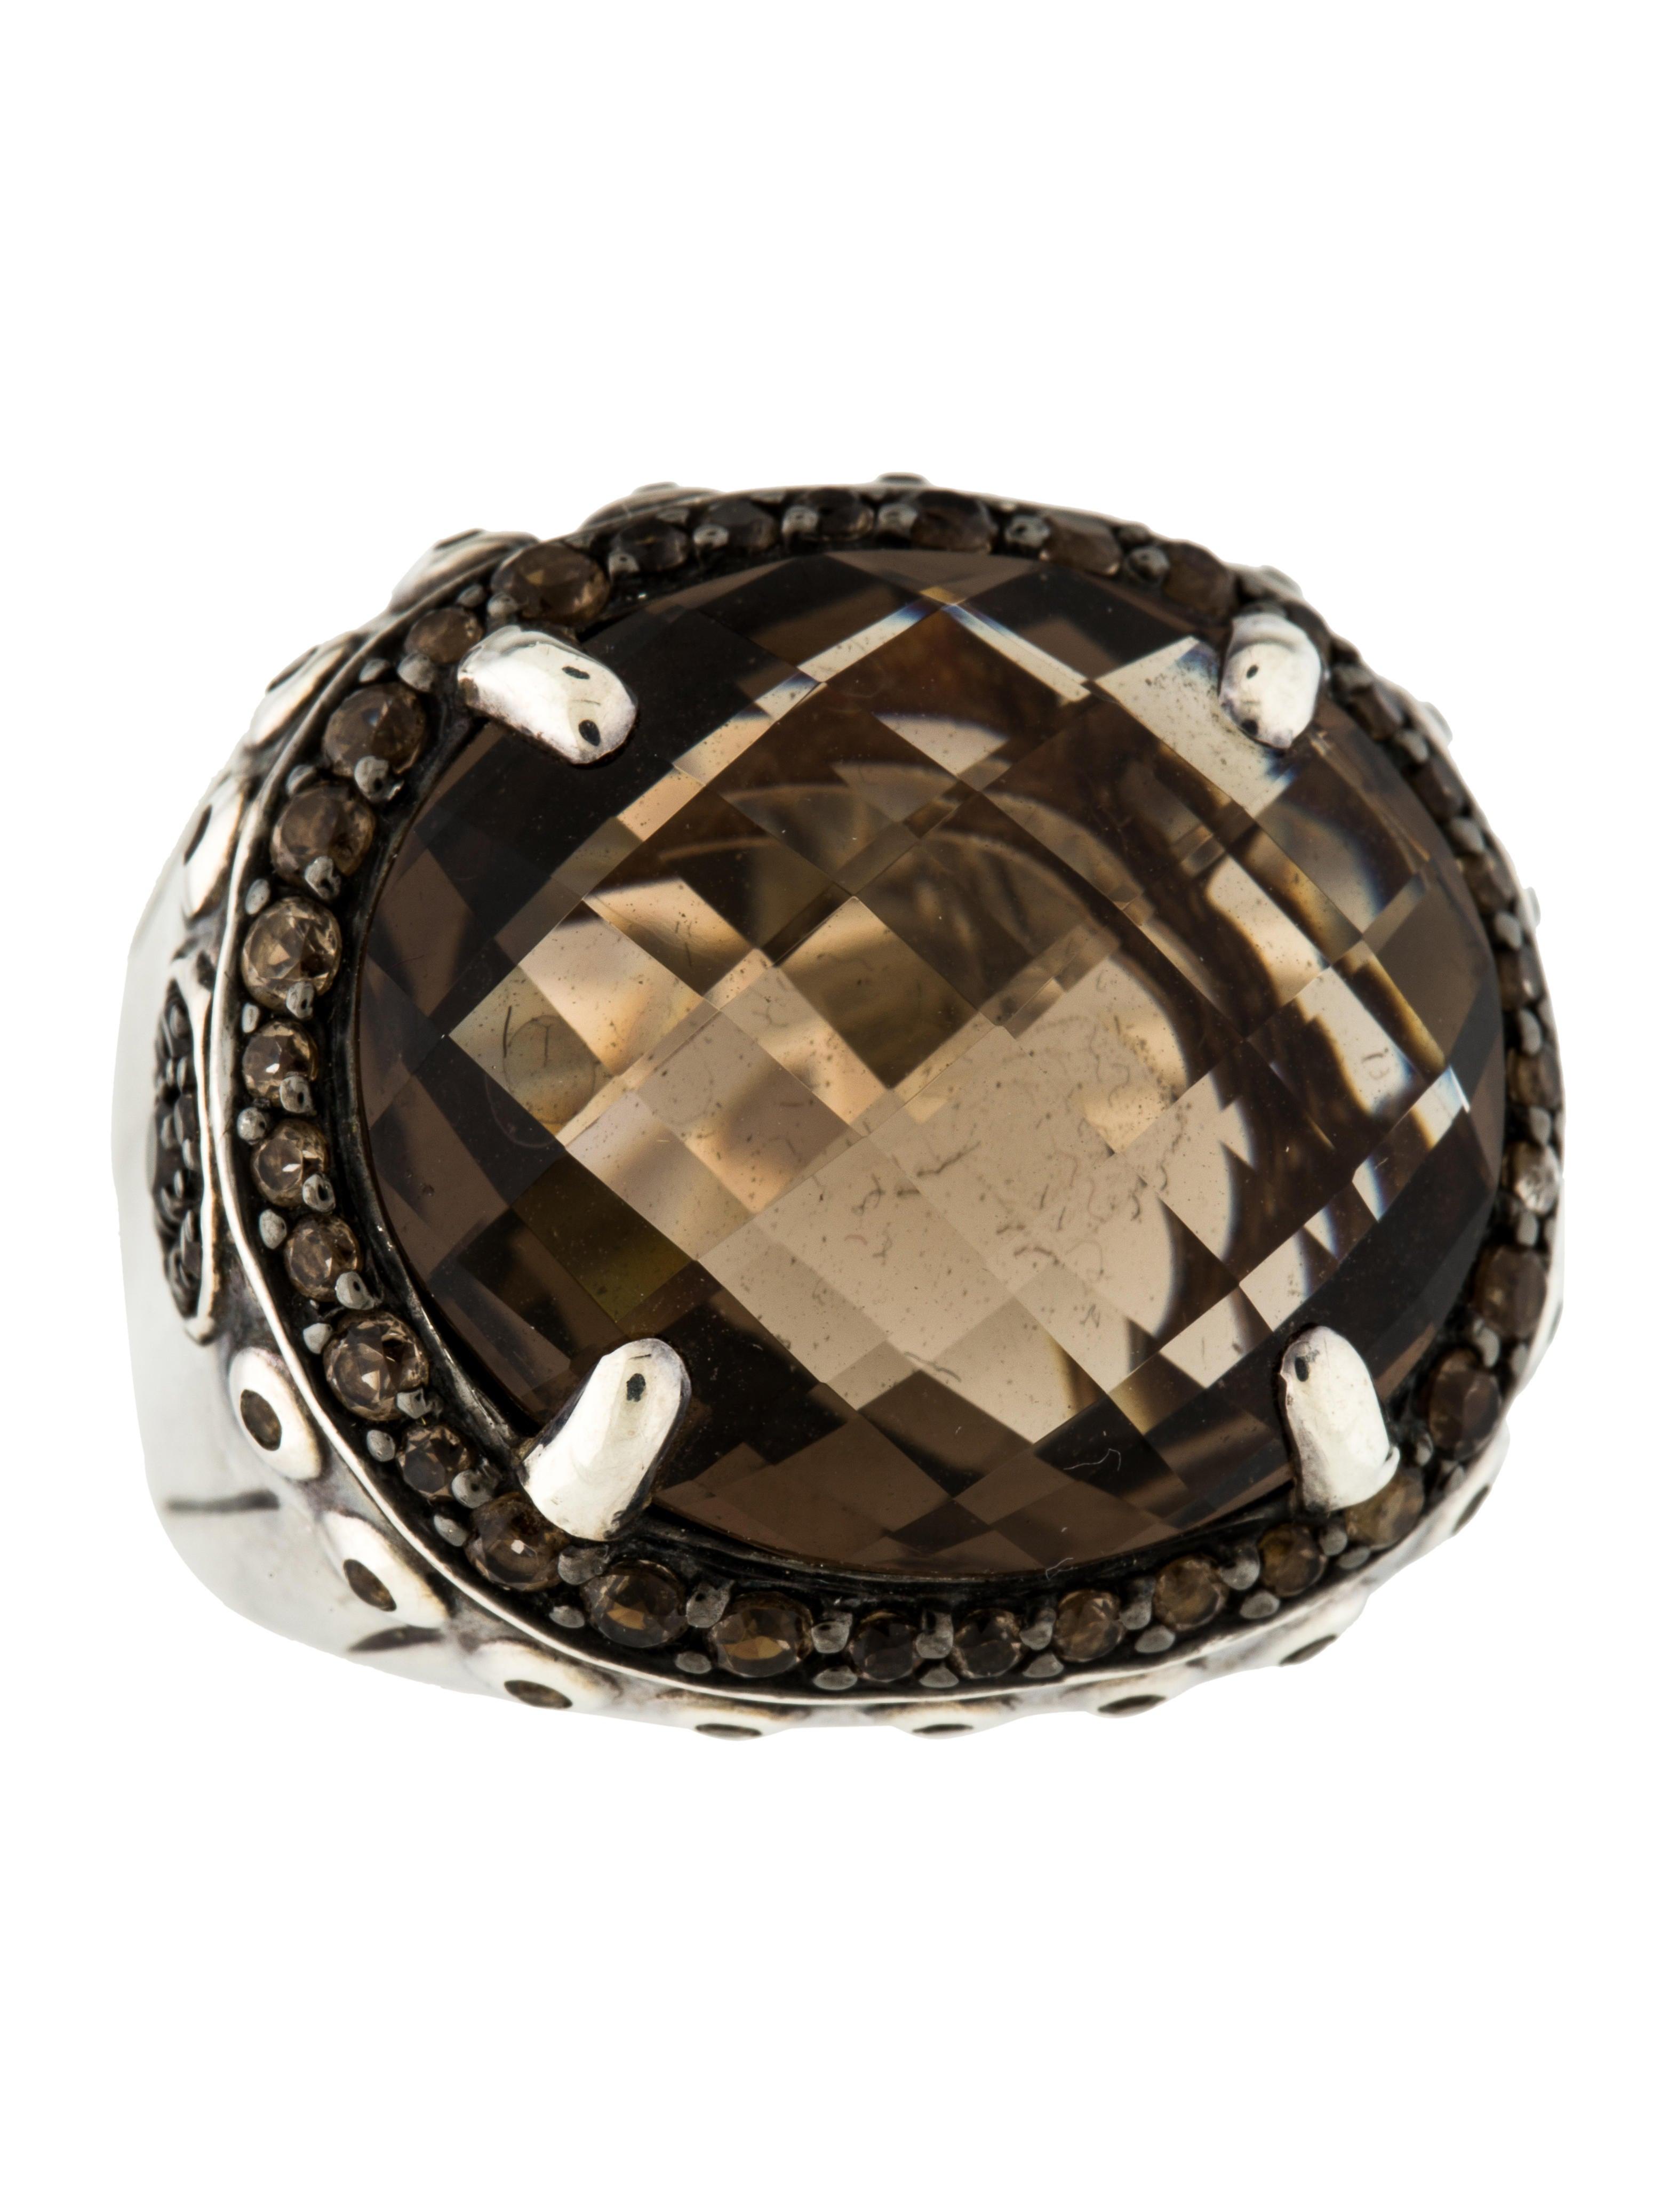 John Hardy Smoky Quartz Batu Bamboo Ring Rings